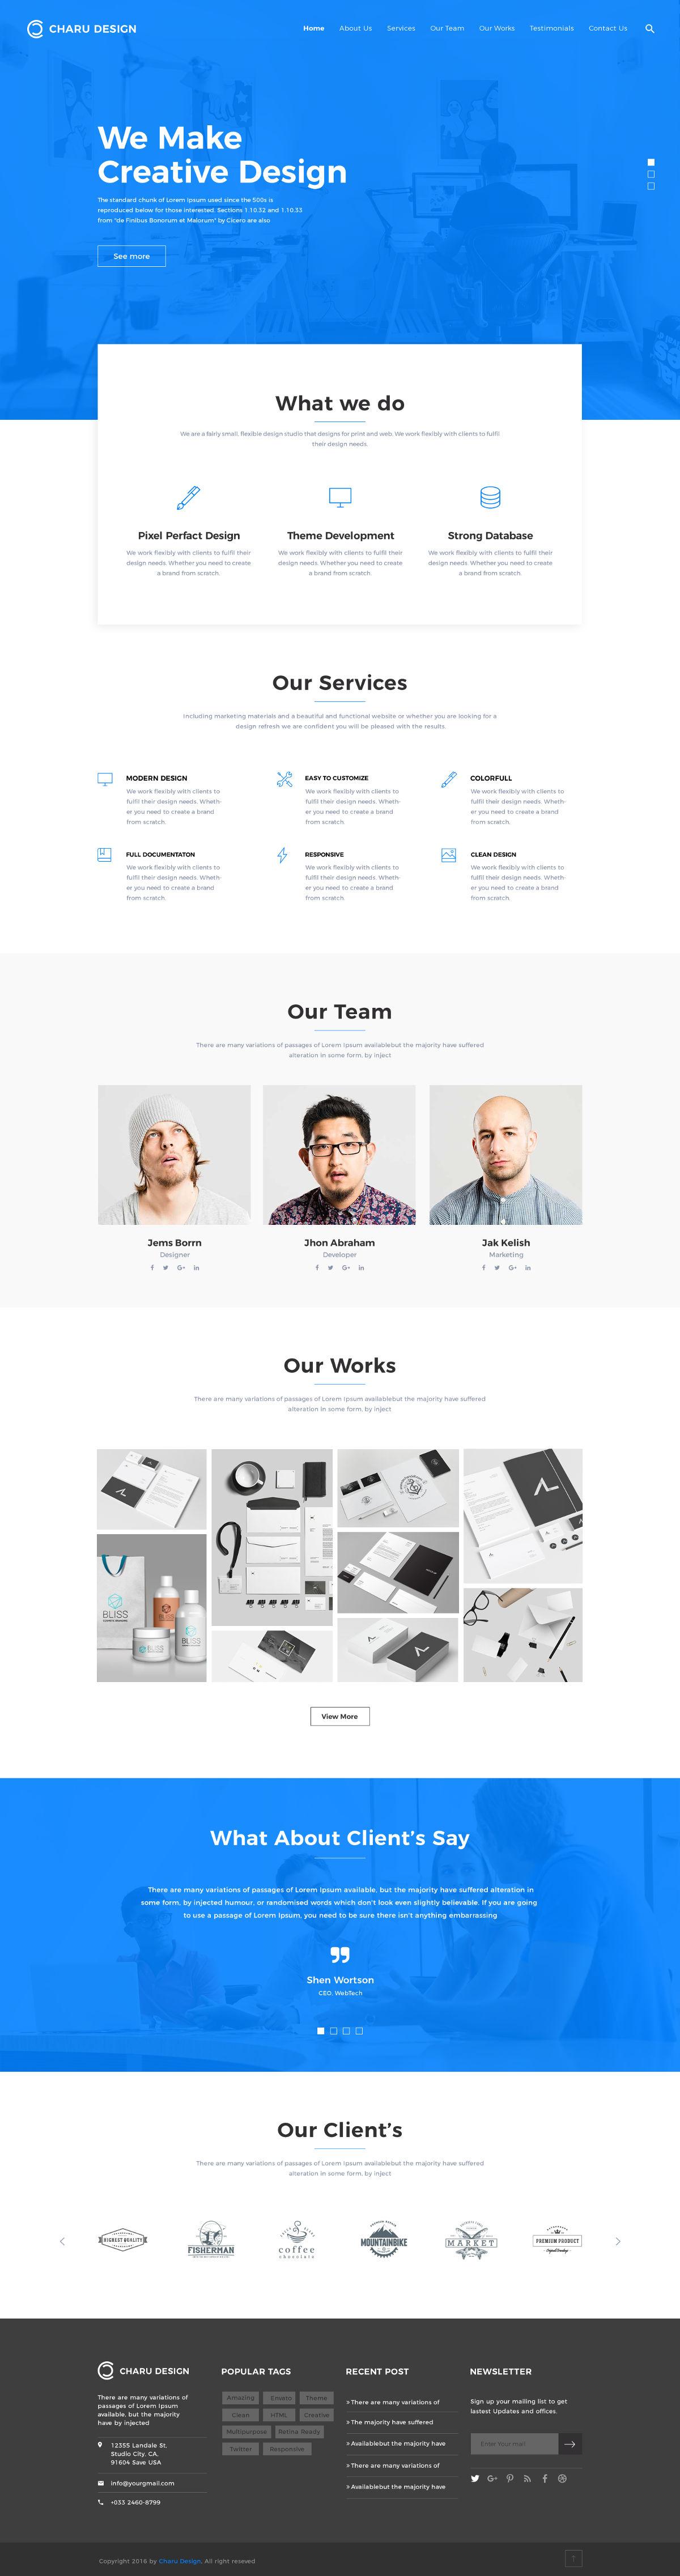 Charu Design Free Website PSD Template